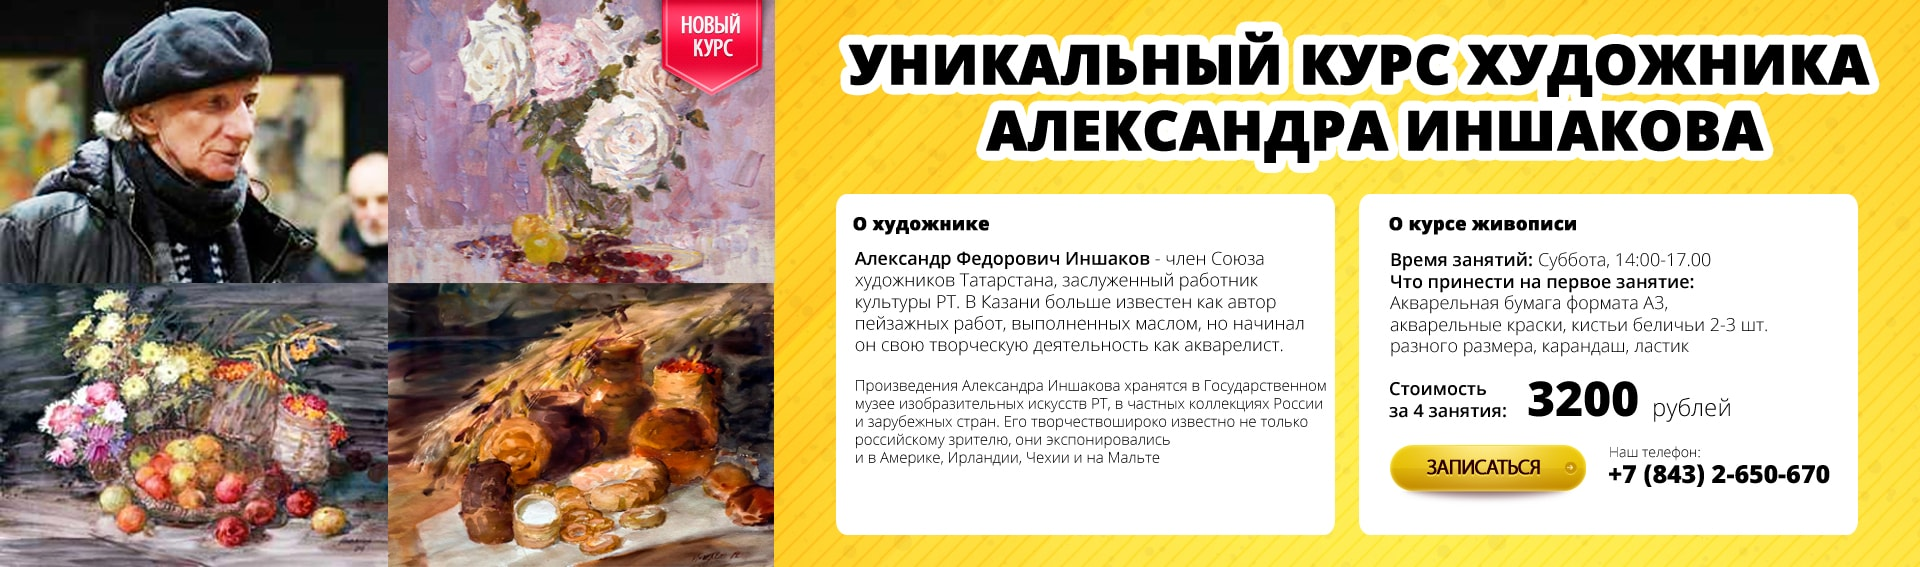 Уникальный курс художника Александра Иншакова